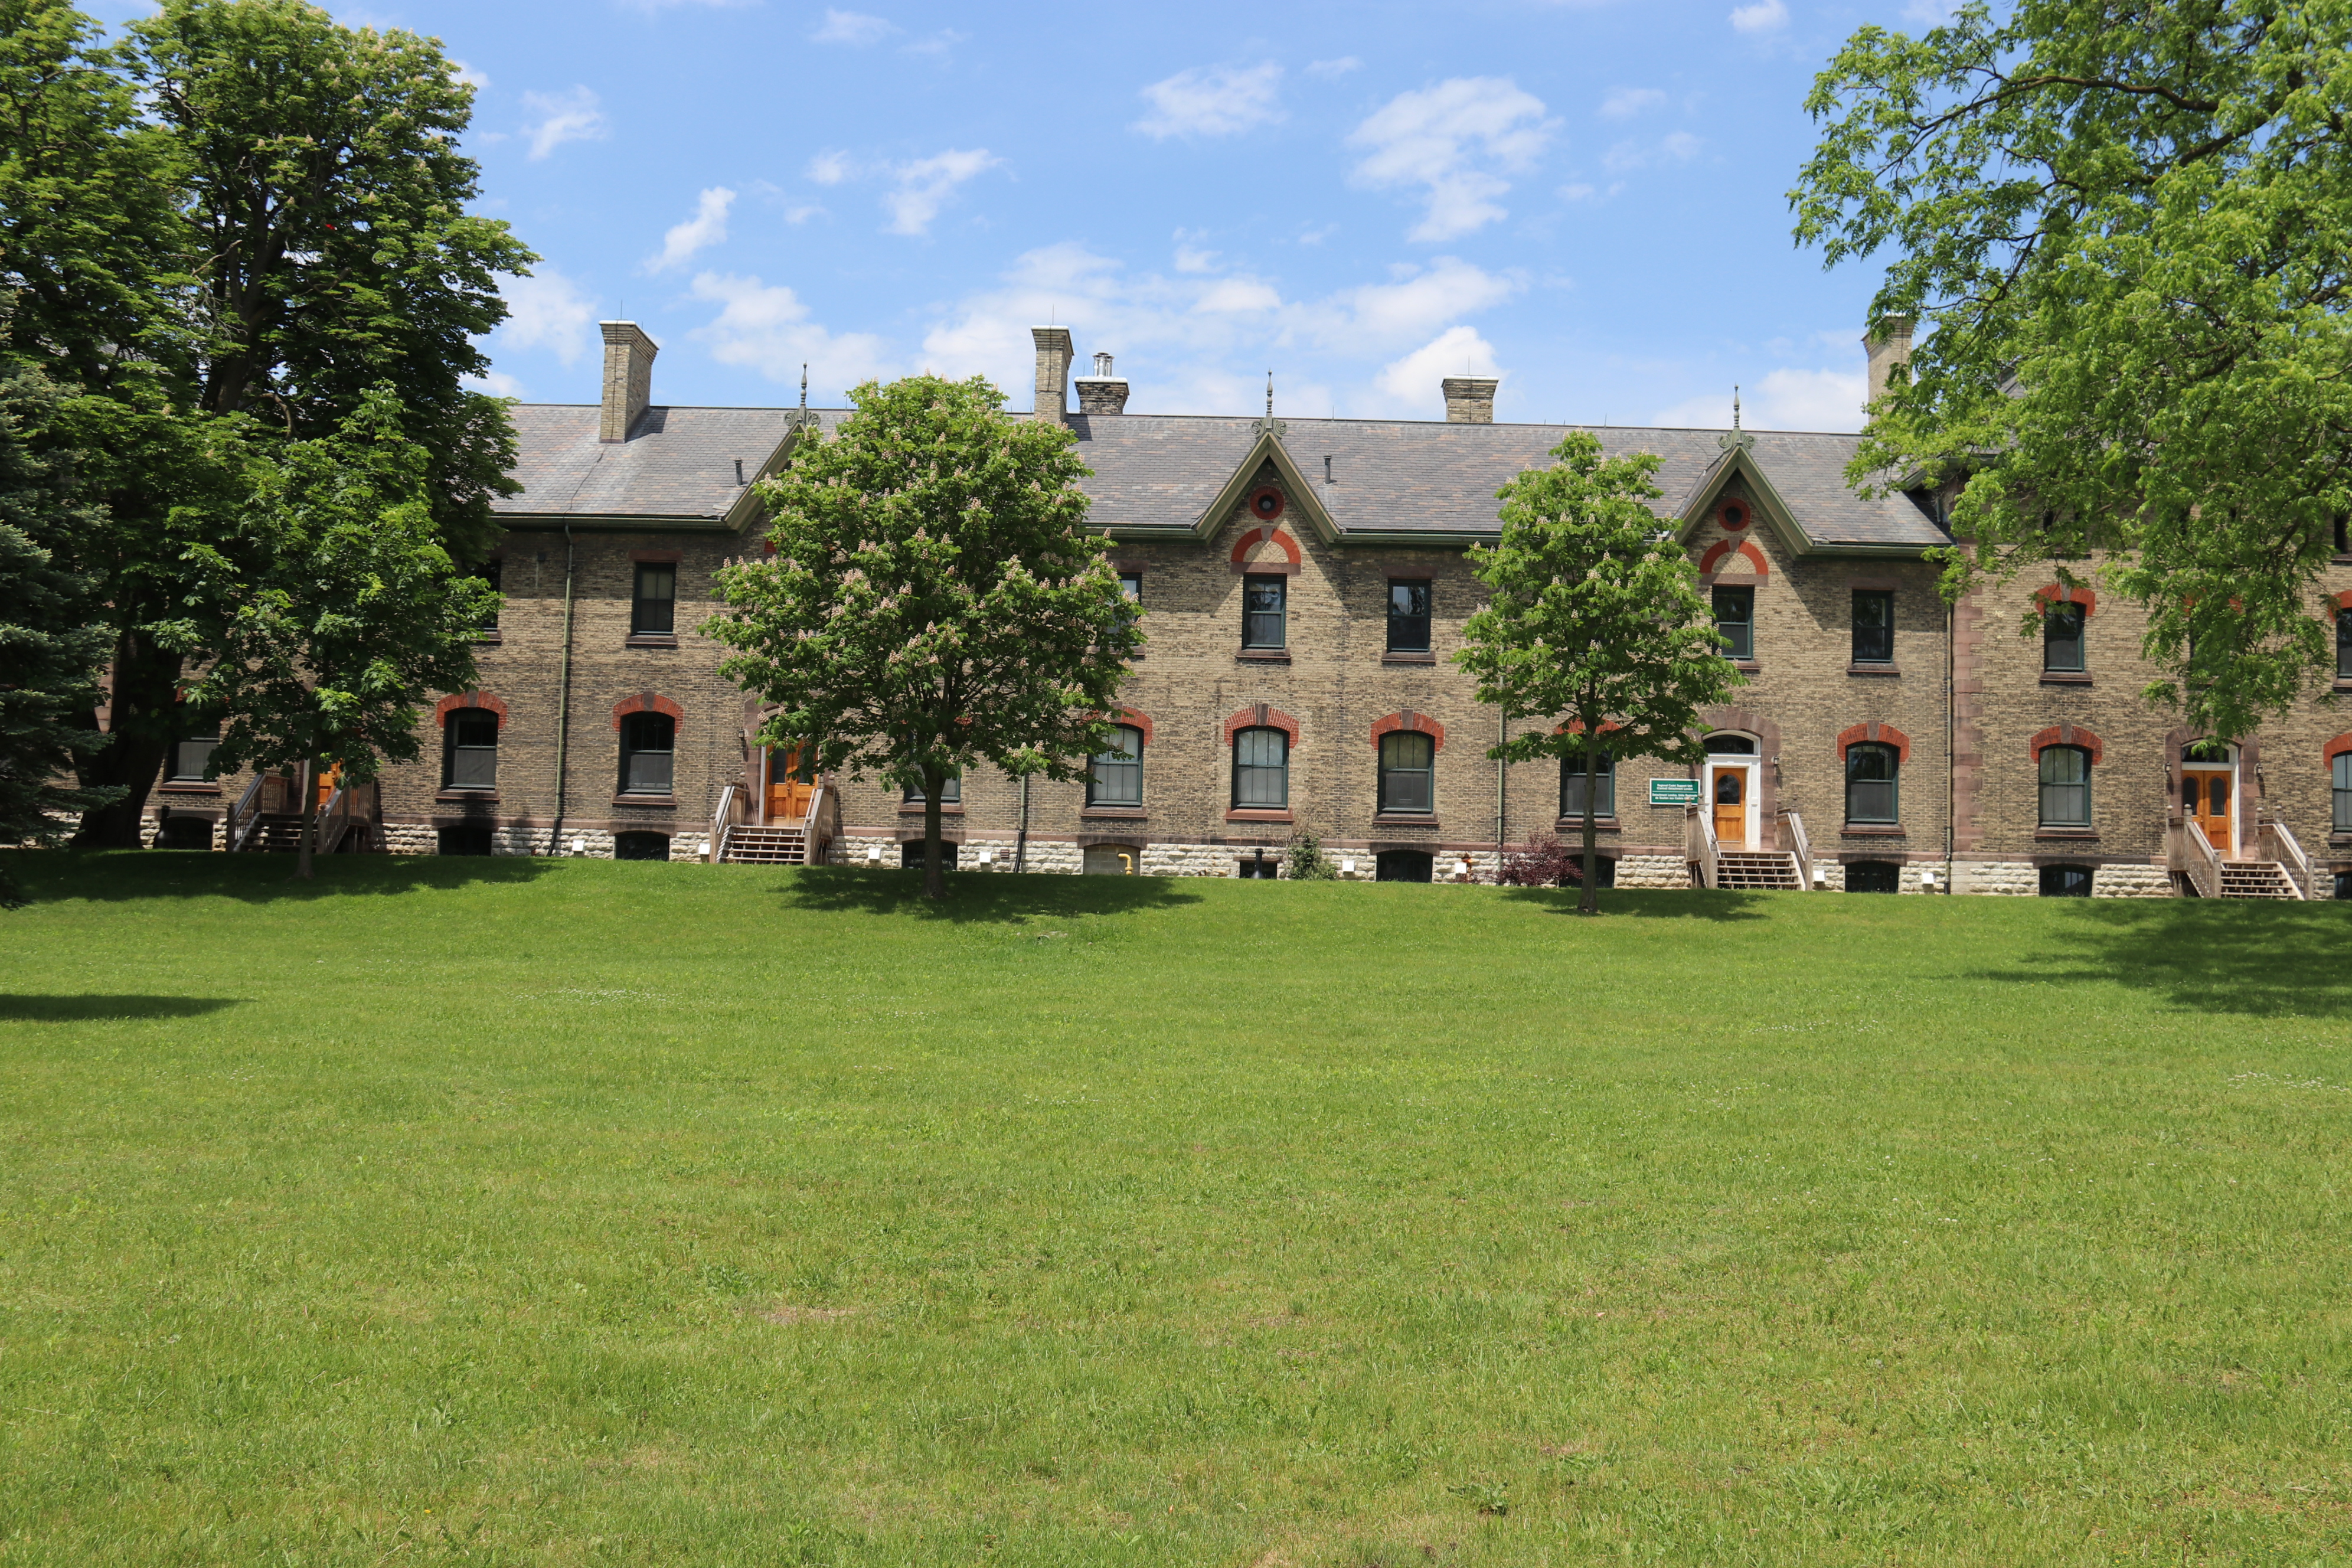 Wolseley Barracks, South Wing